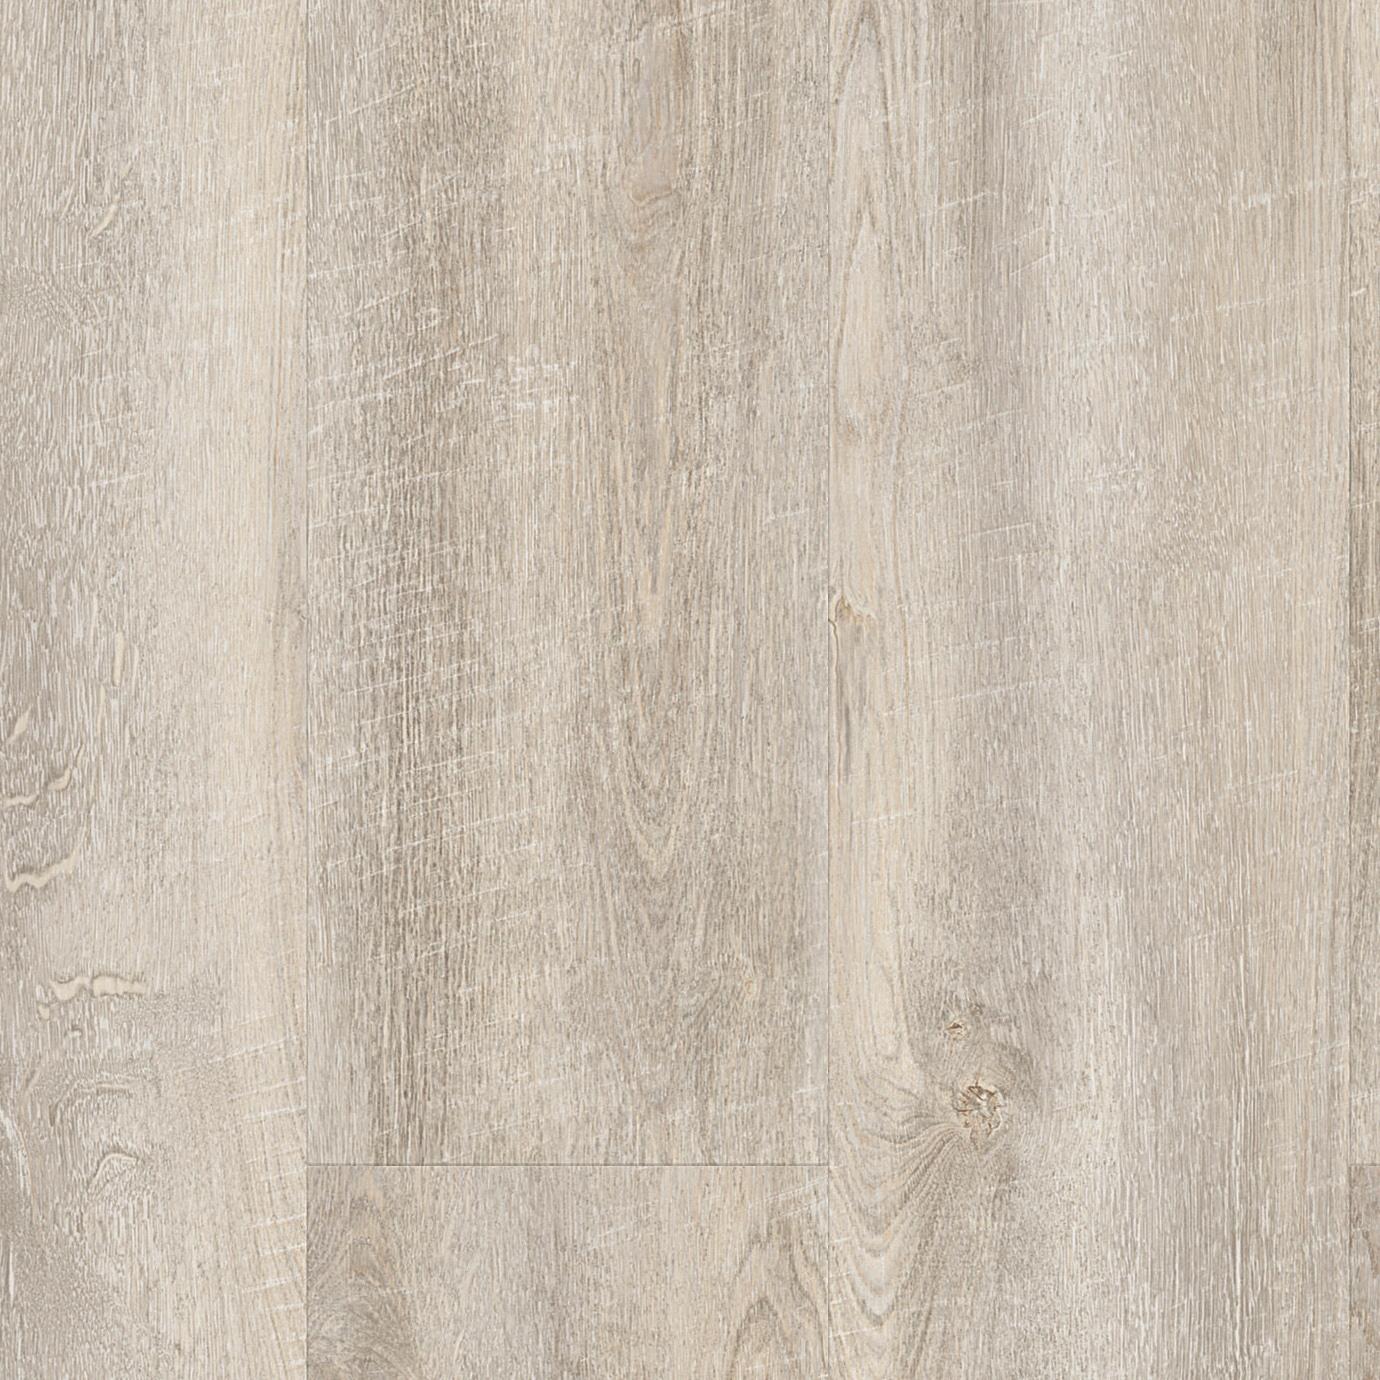 vinylgolv tarkett starfloor click antik oak white bygggrossen. Black Bedroom Furniture Sets. Home Design Ideas